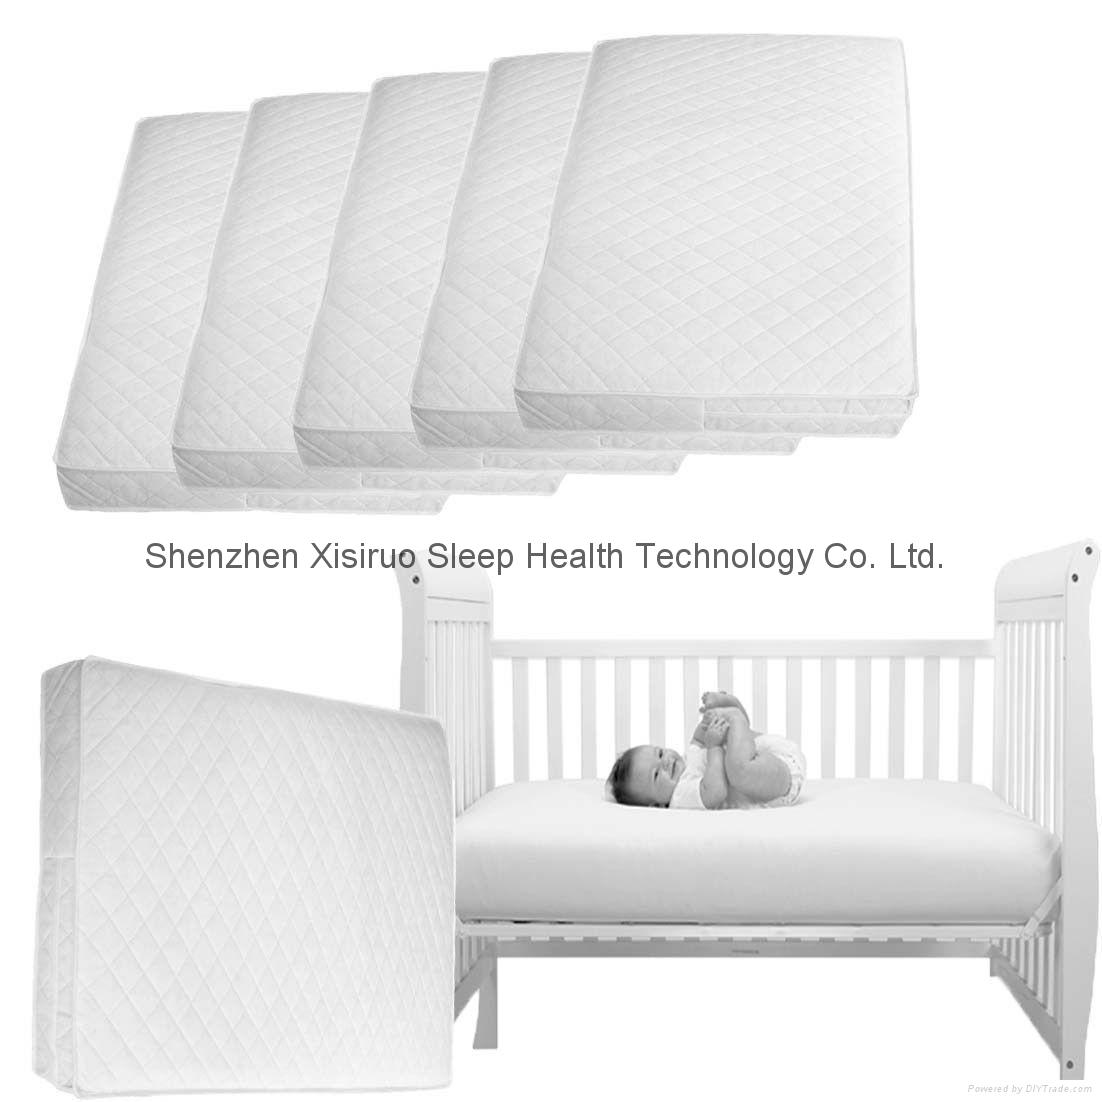 Baby Crib Memory Foam Mattress Premium Hypoallergenic Plush Bed Cover Waterproof 1